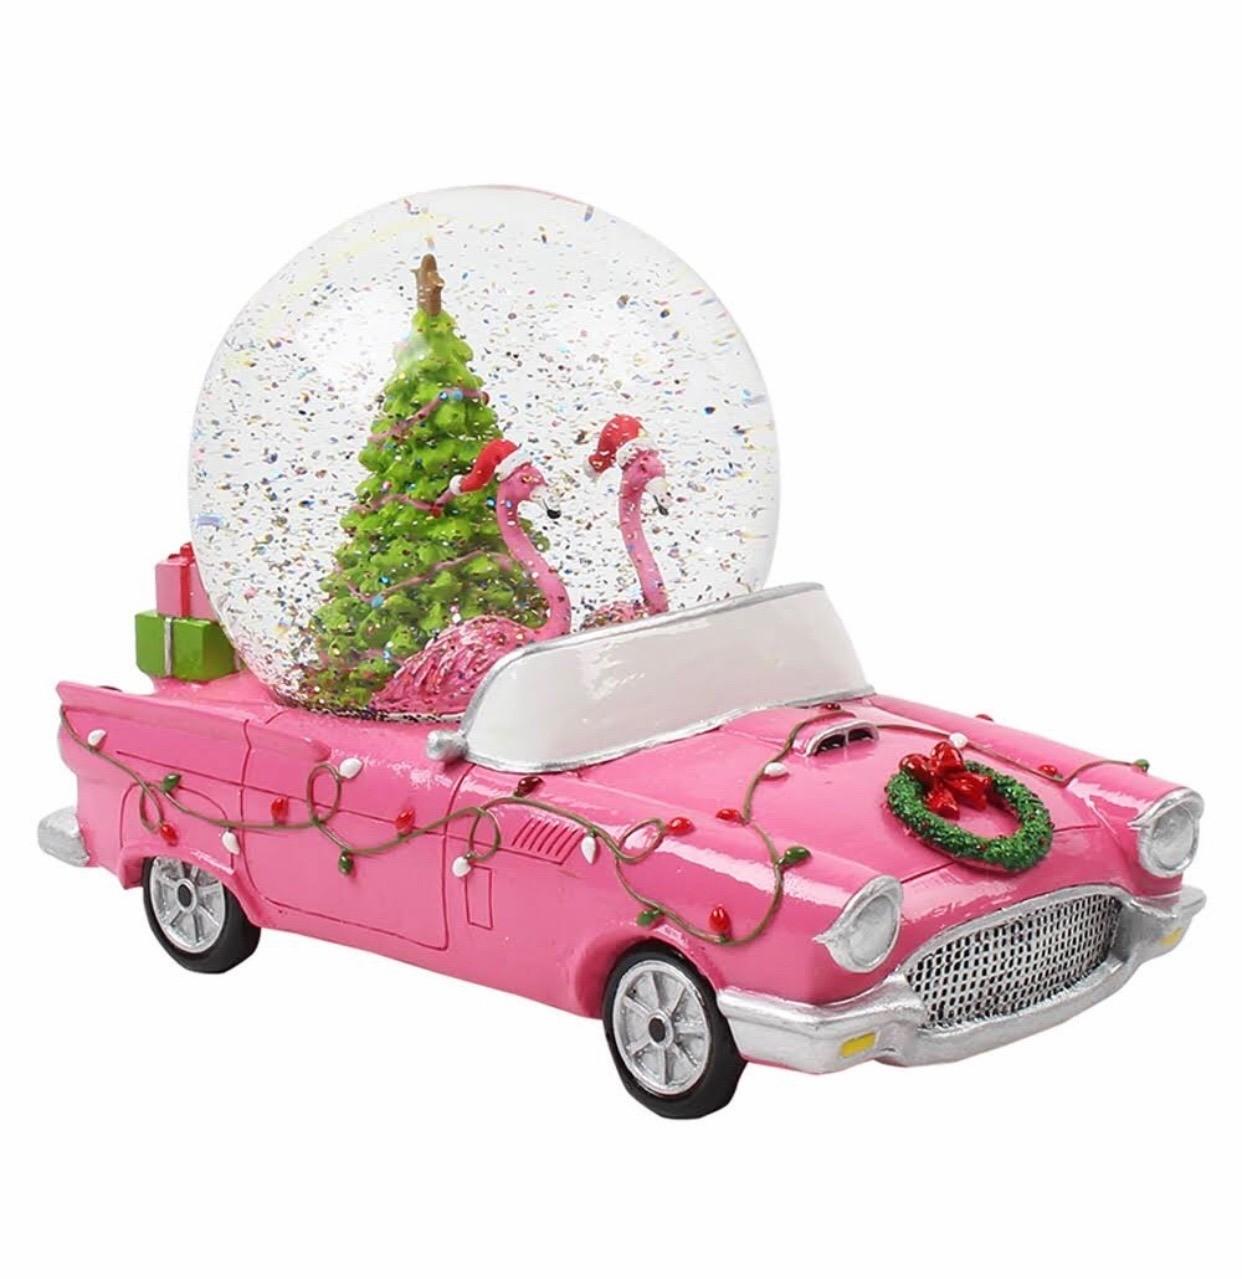 Flamingo_Christmas_Snow_Globe